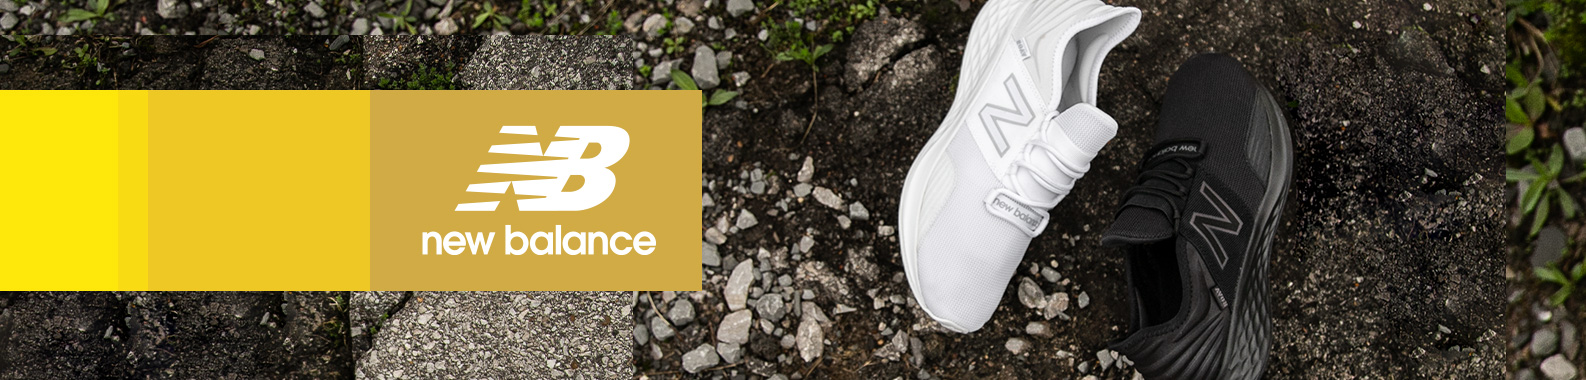 New Balance brand header image